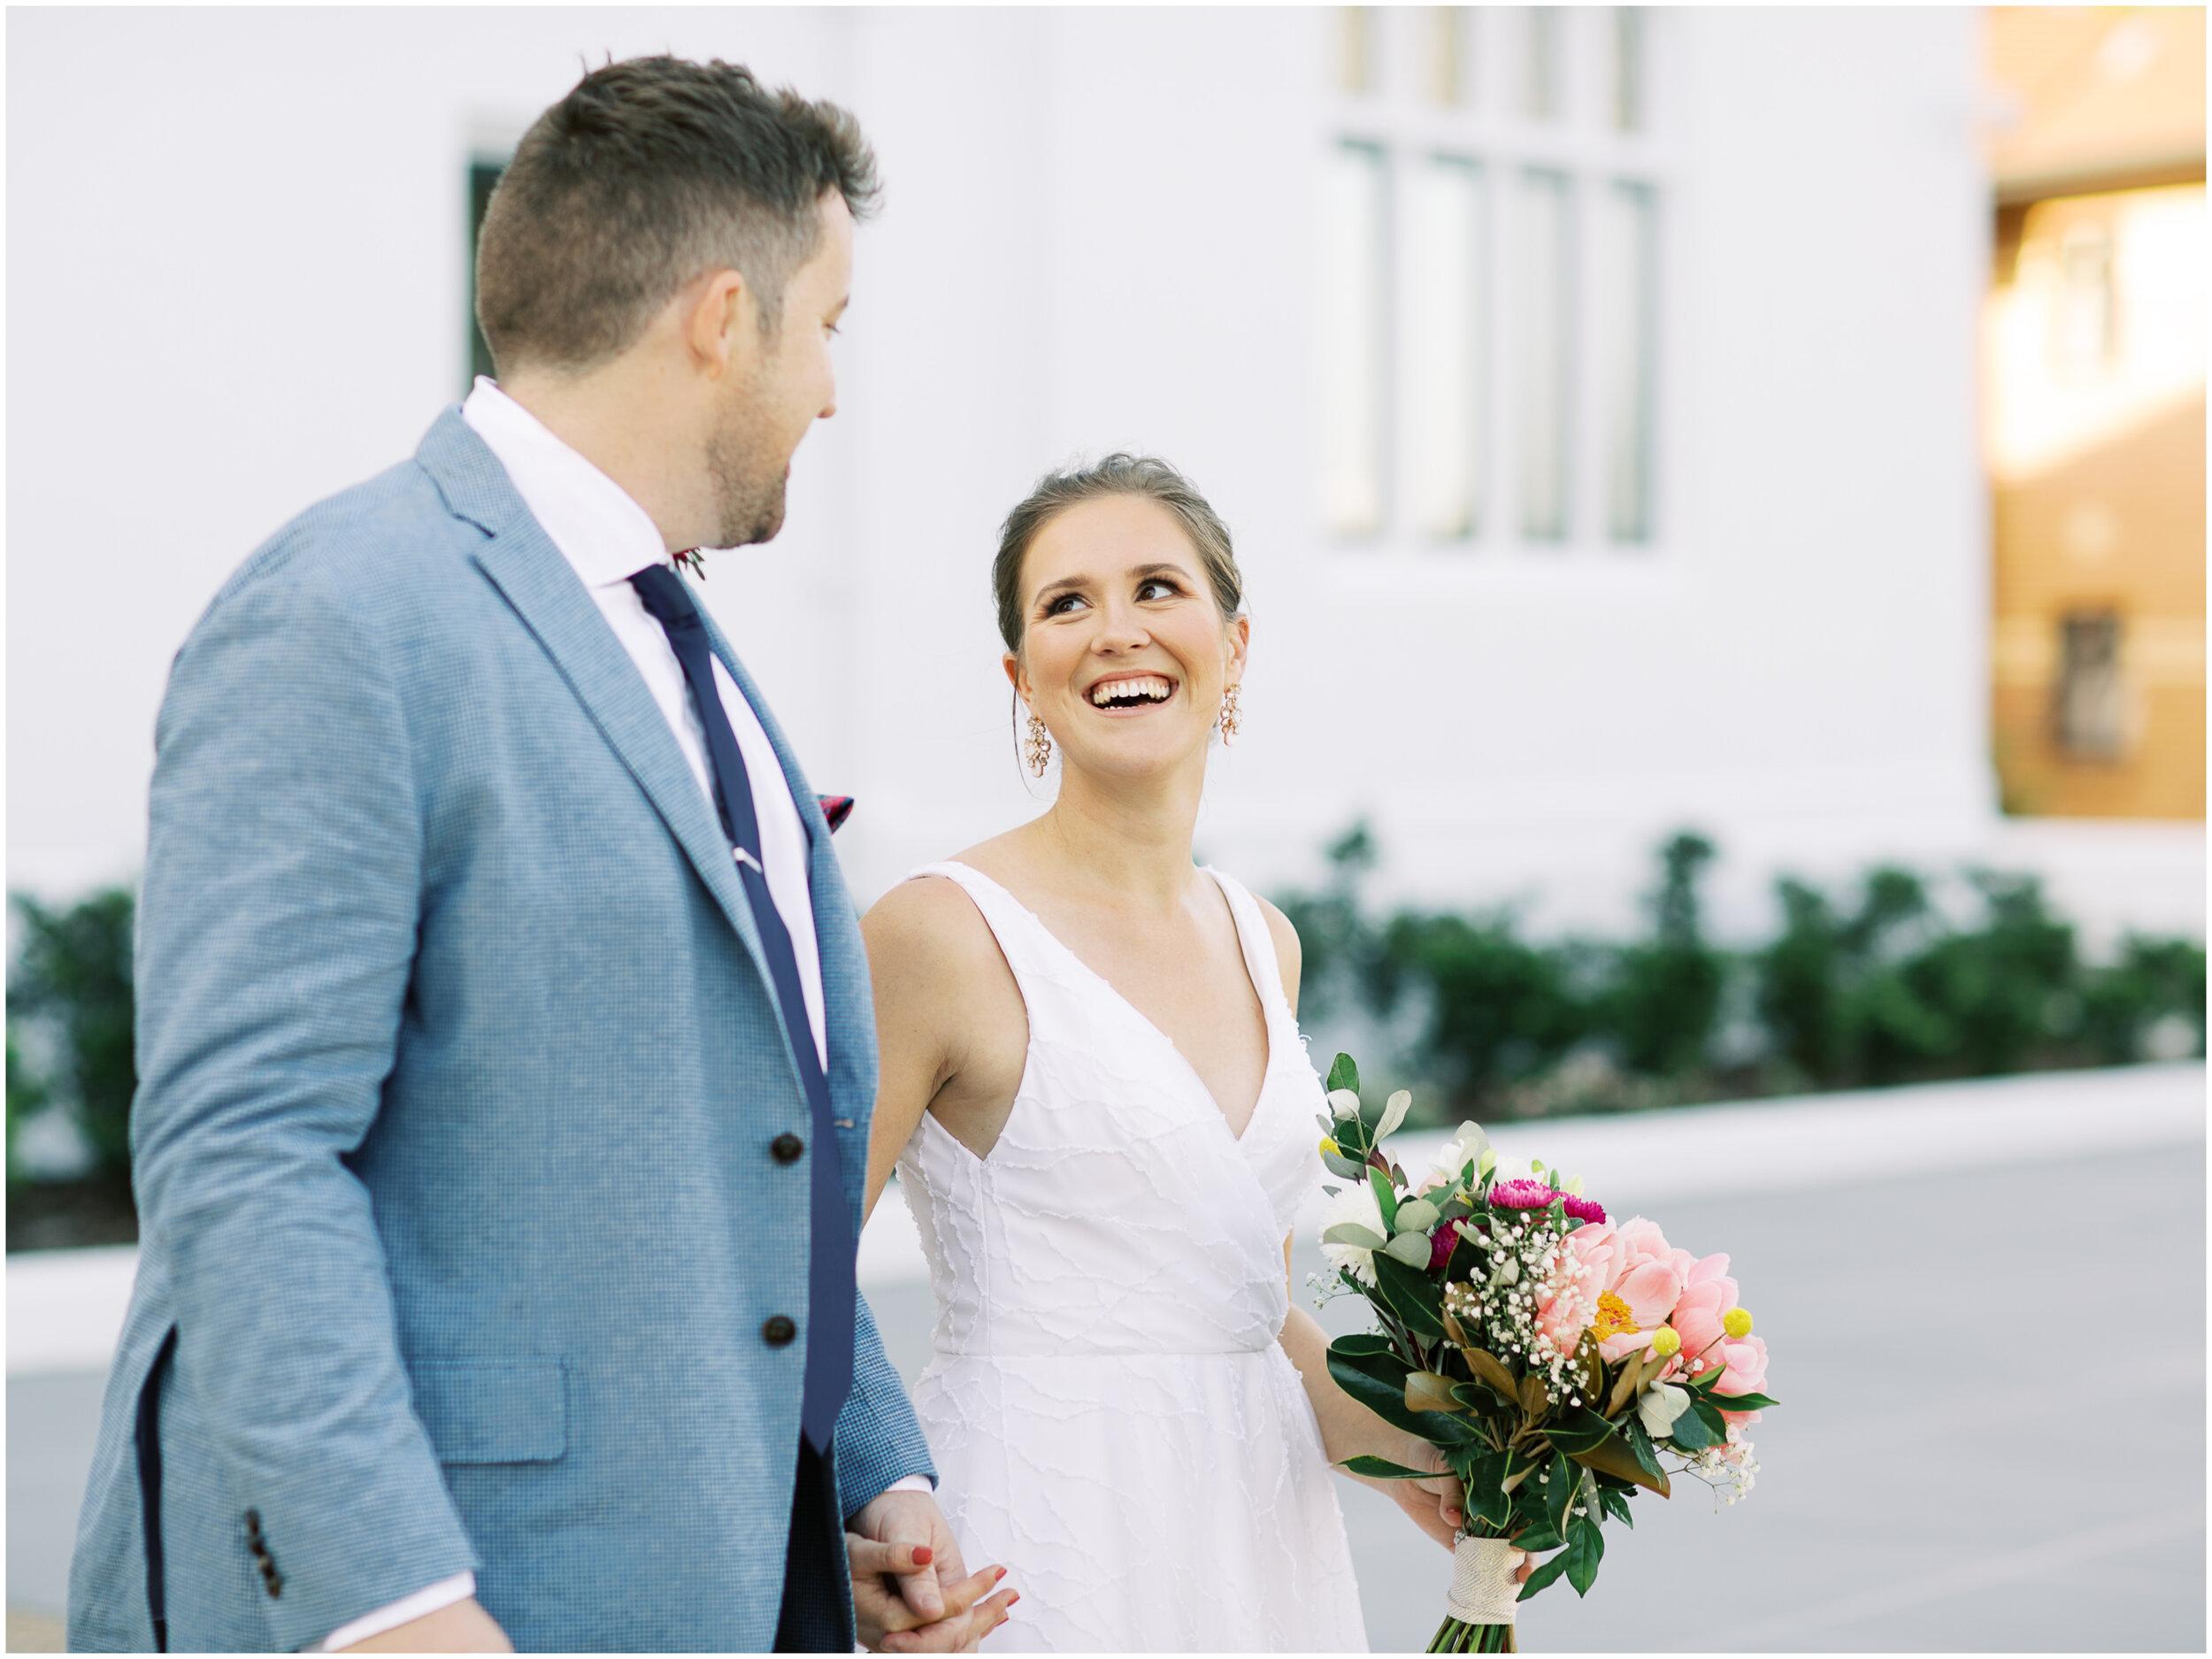 fine-art-australian-destination-wedding-photographer-20.jpg